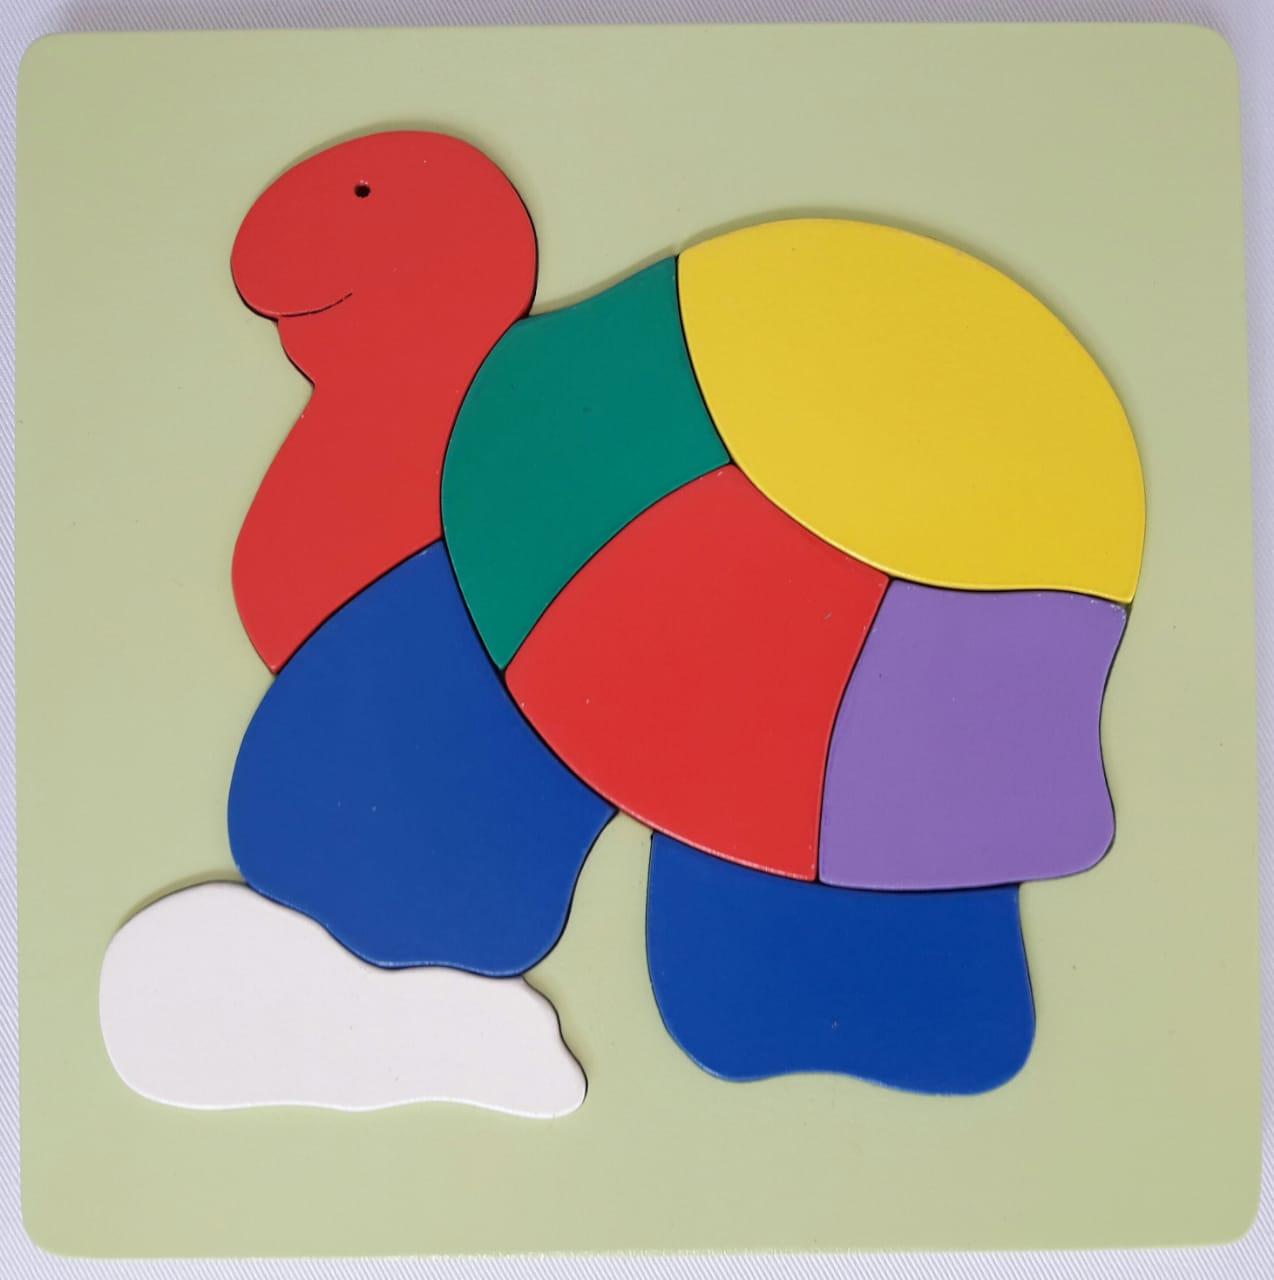 Jual Puzzle Kayu Murah Puzzle hewan binatang kura - kura